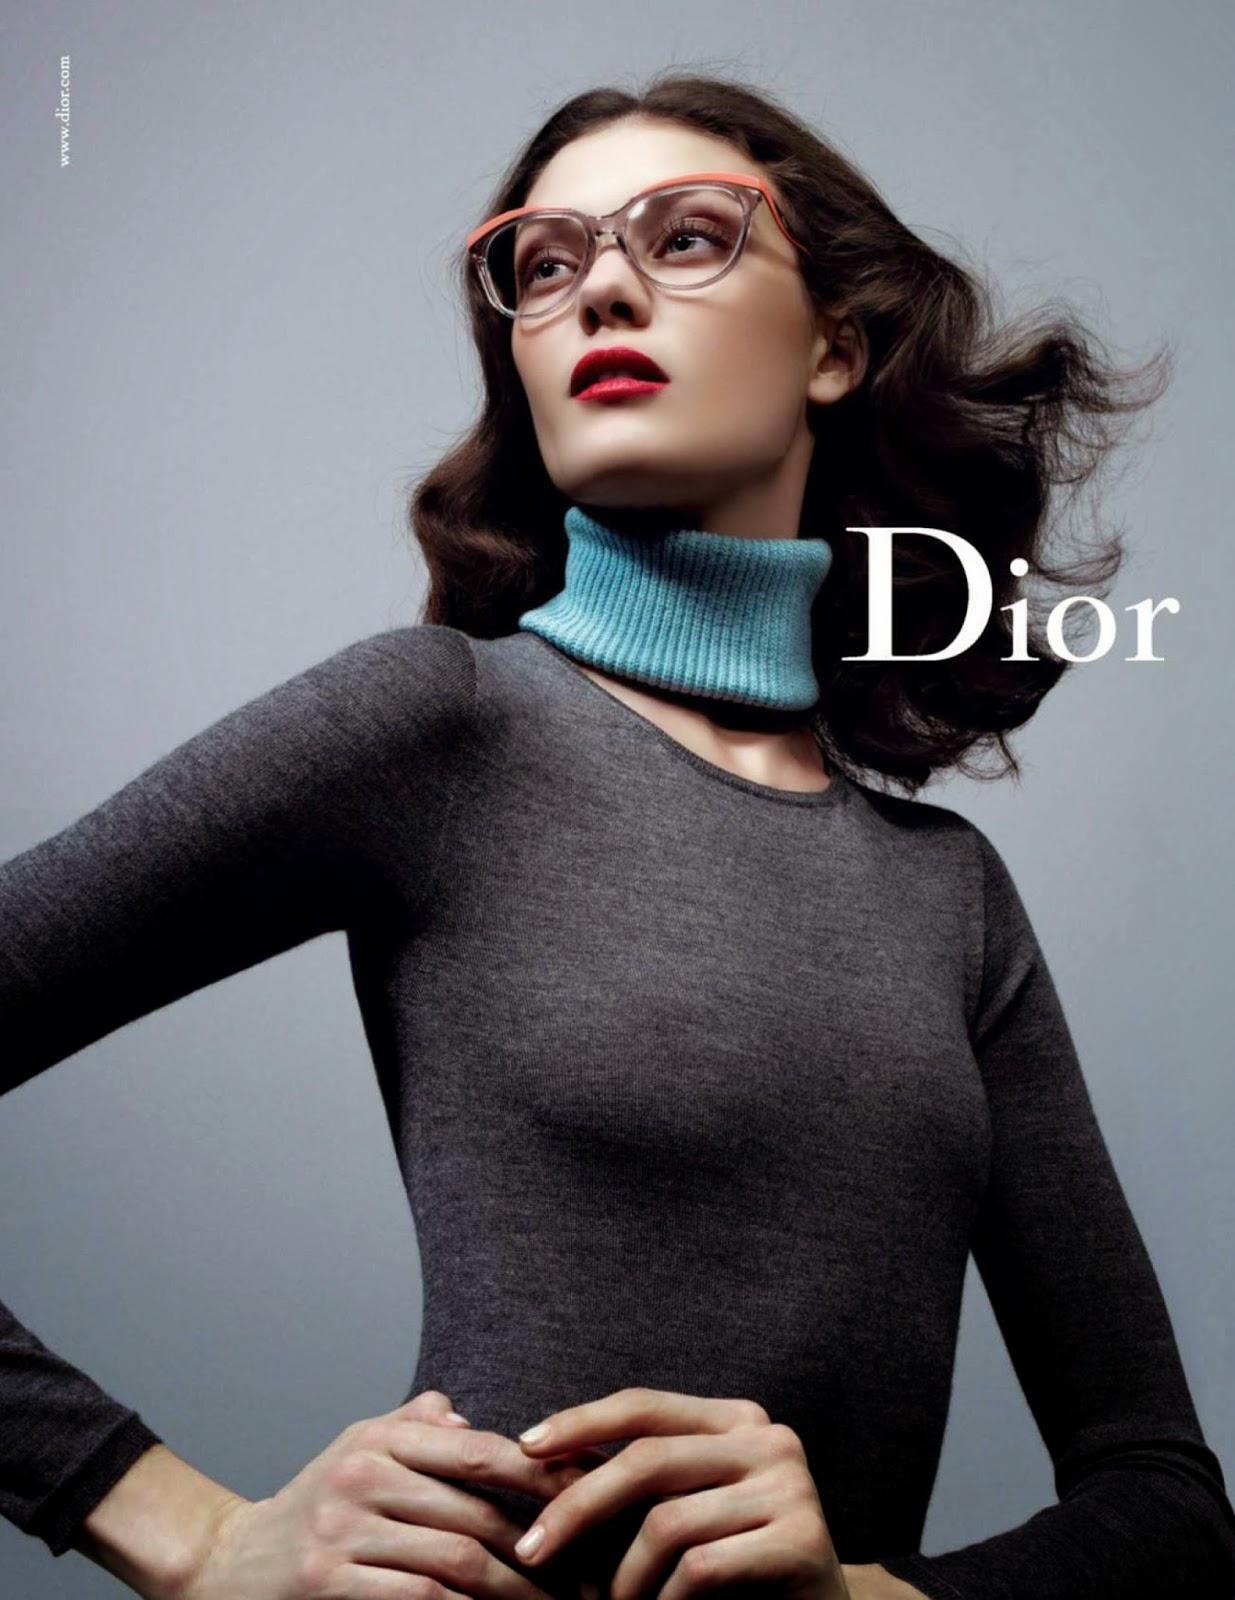 Dior Eyeglass Frames 2014 : Dior Eyewear 2014 Dior Pinterest